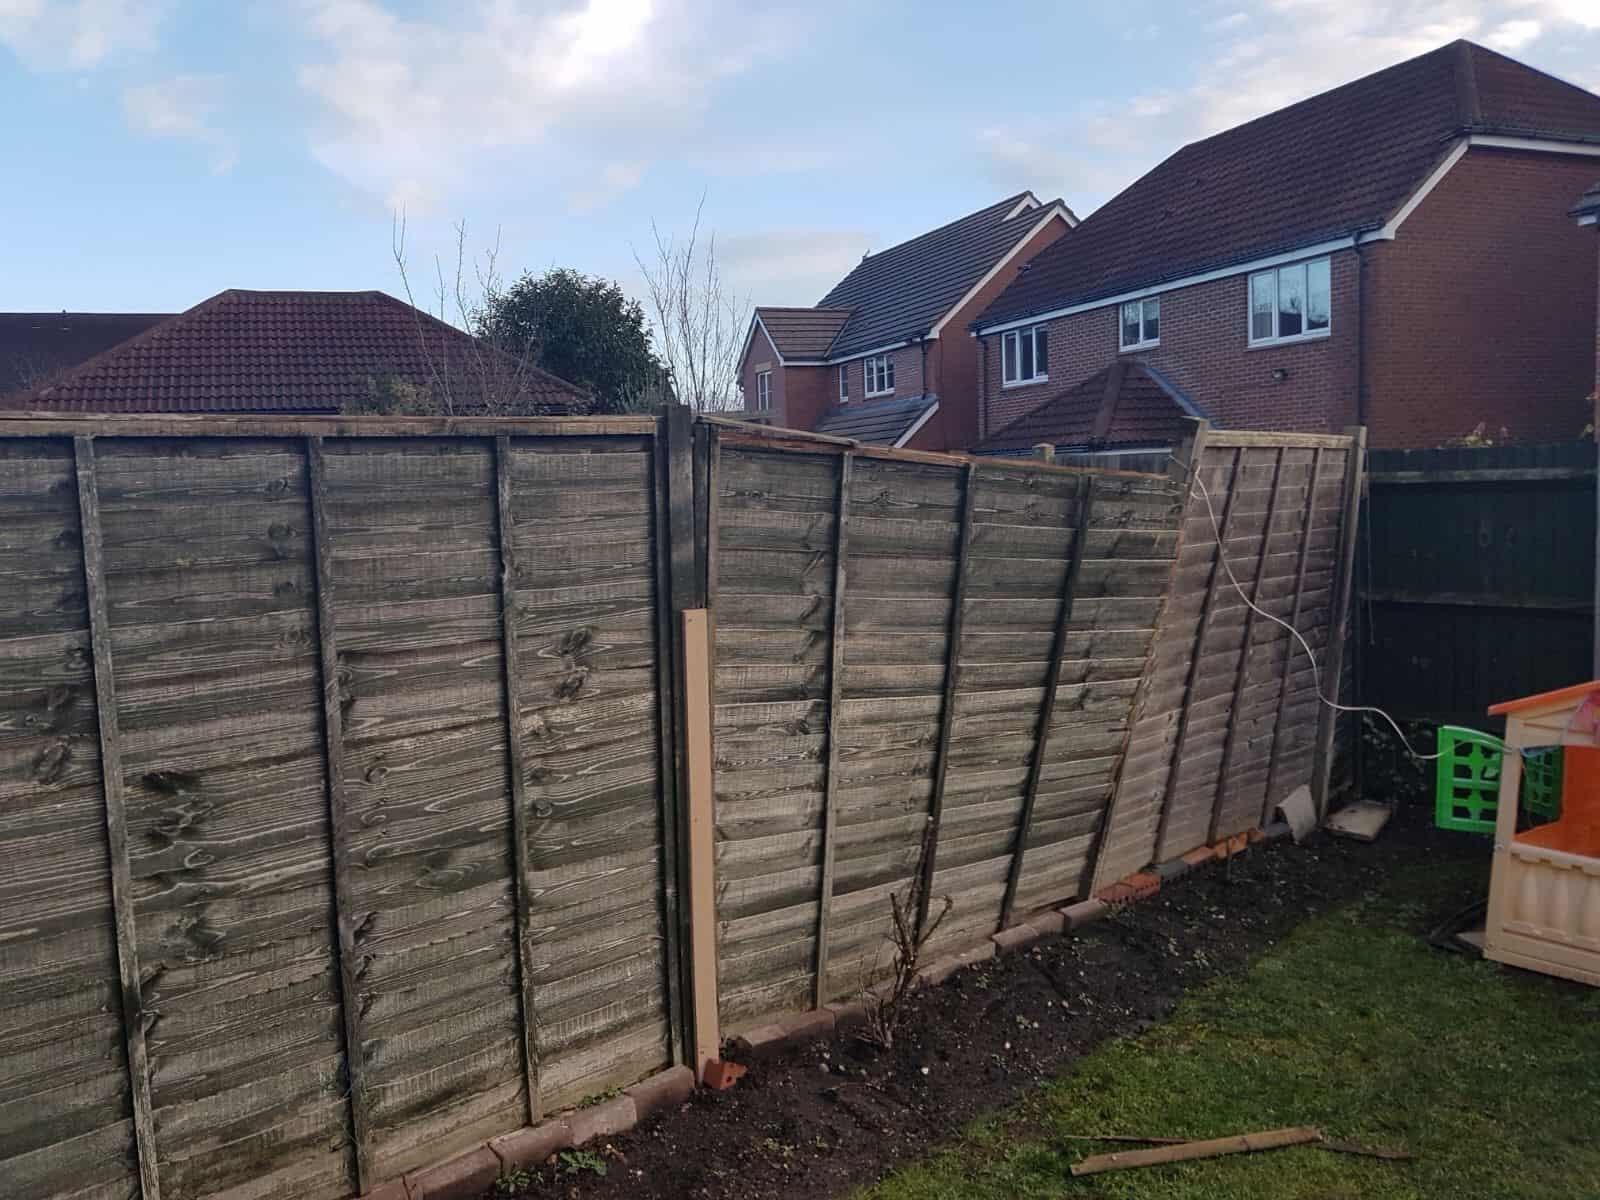 Garden fence work / fencing